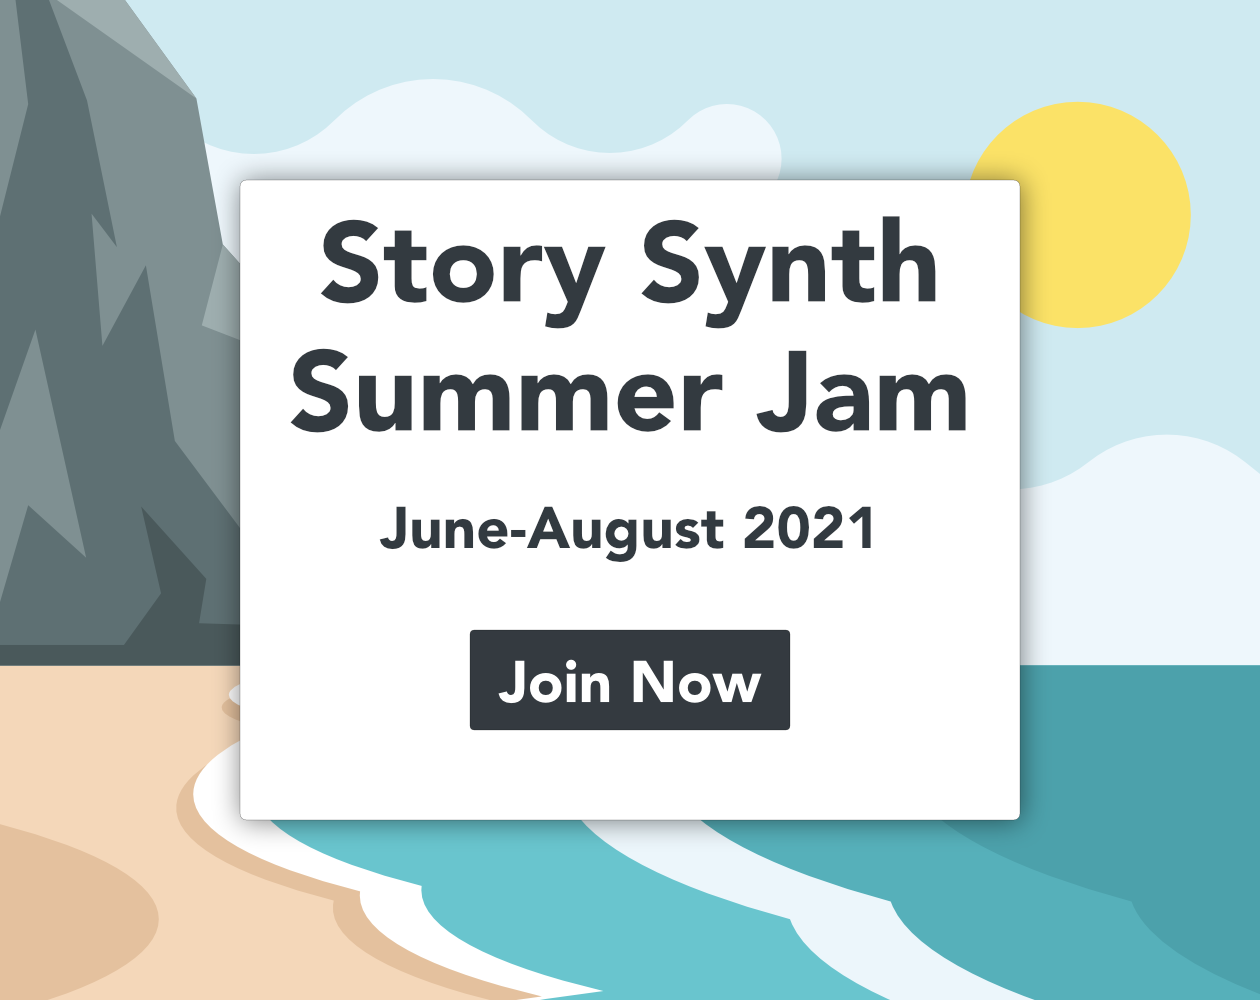 Story Synth Summer Jam logo